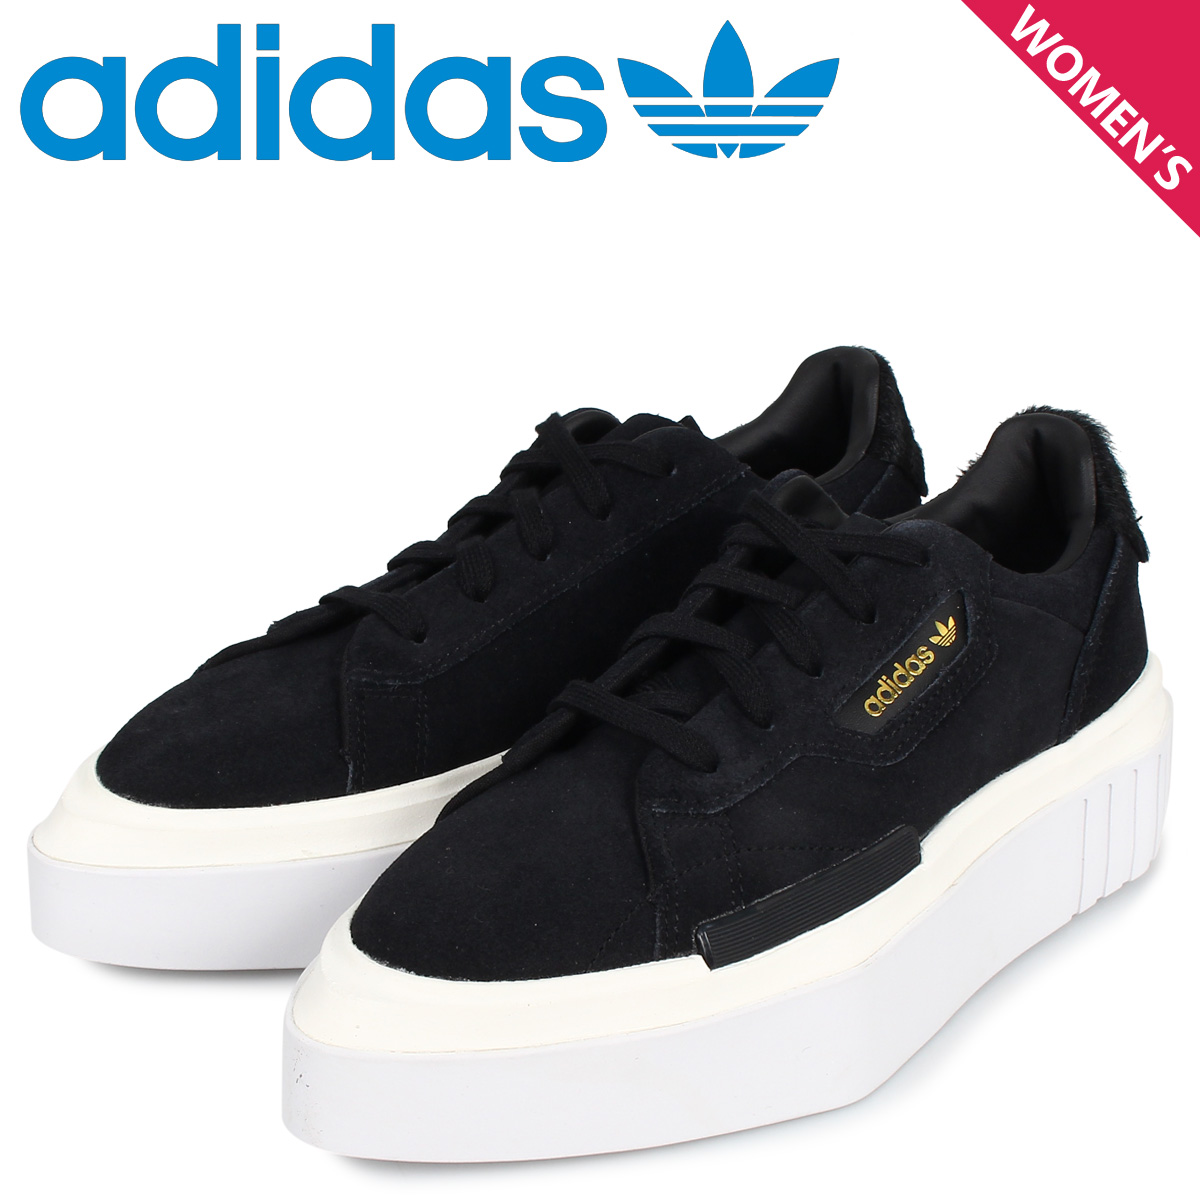 adidas Originals アディダス オリジナルス ハイパースリーク スニーカー レディース HYPERSLEEK W ブラック 黒 EE7037